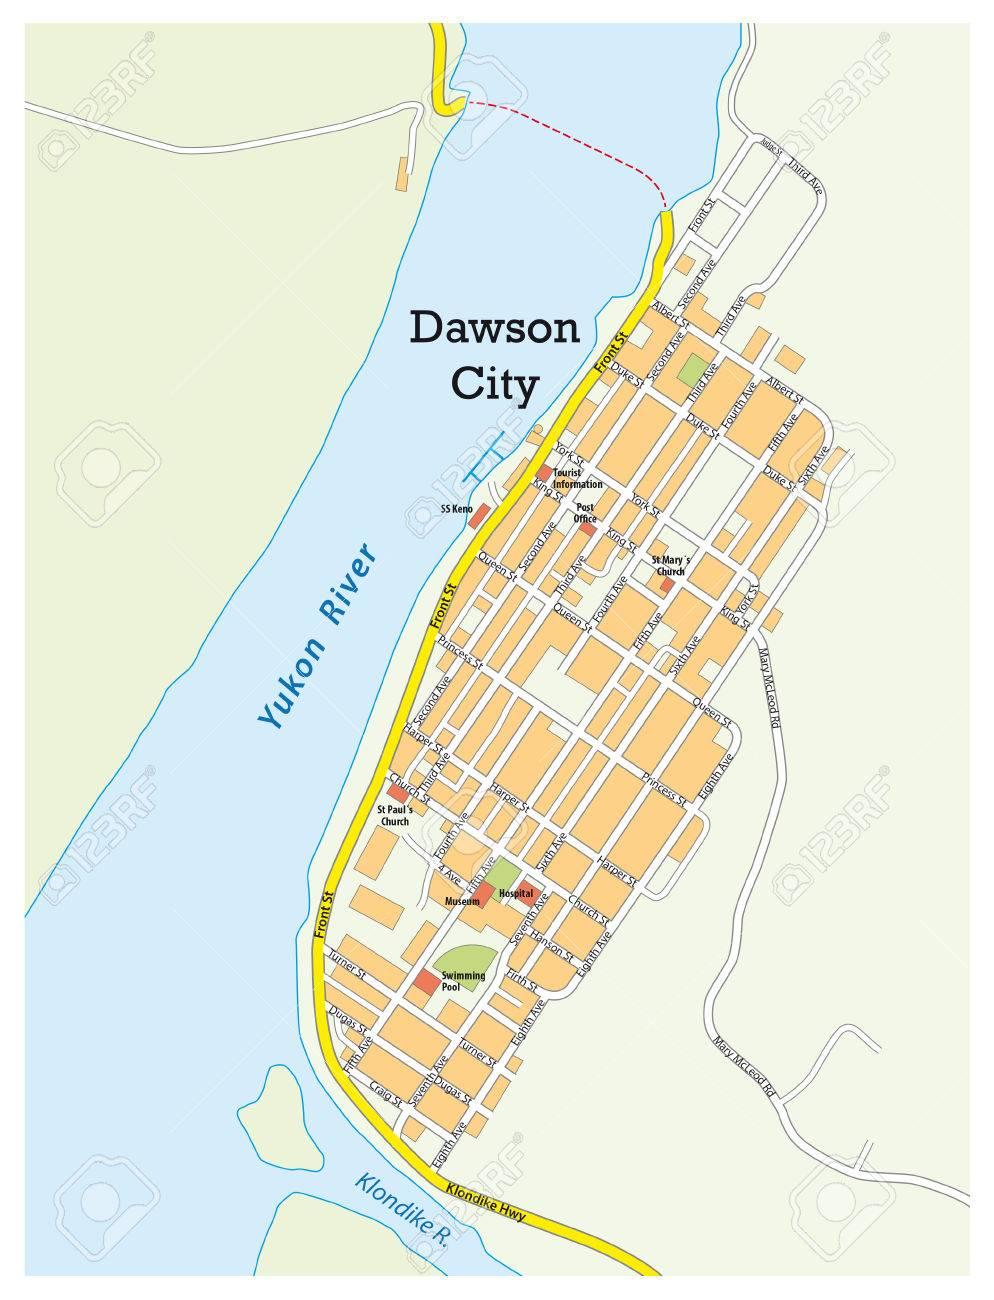 City ??map Of Dawson City Yukon Territory, Canada Royalty Free